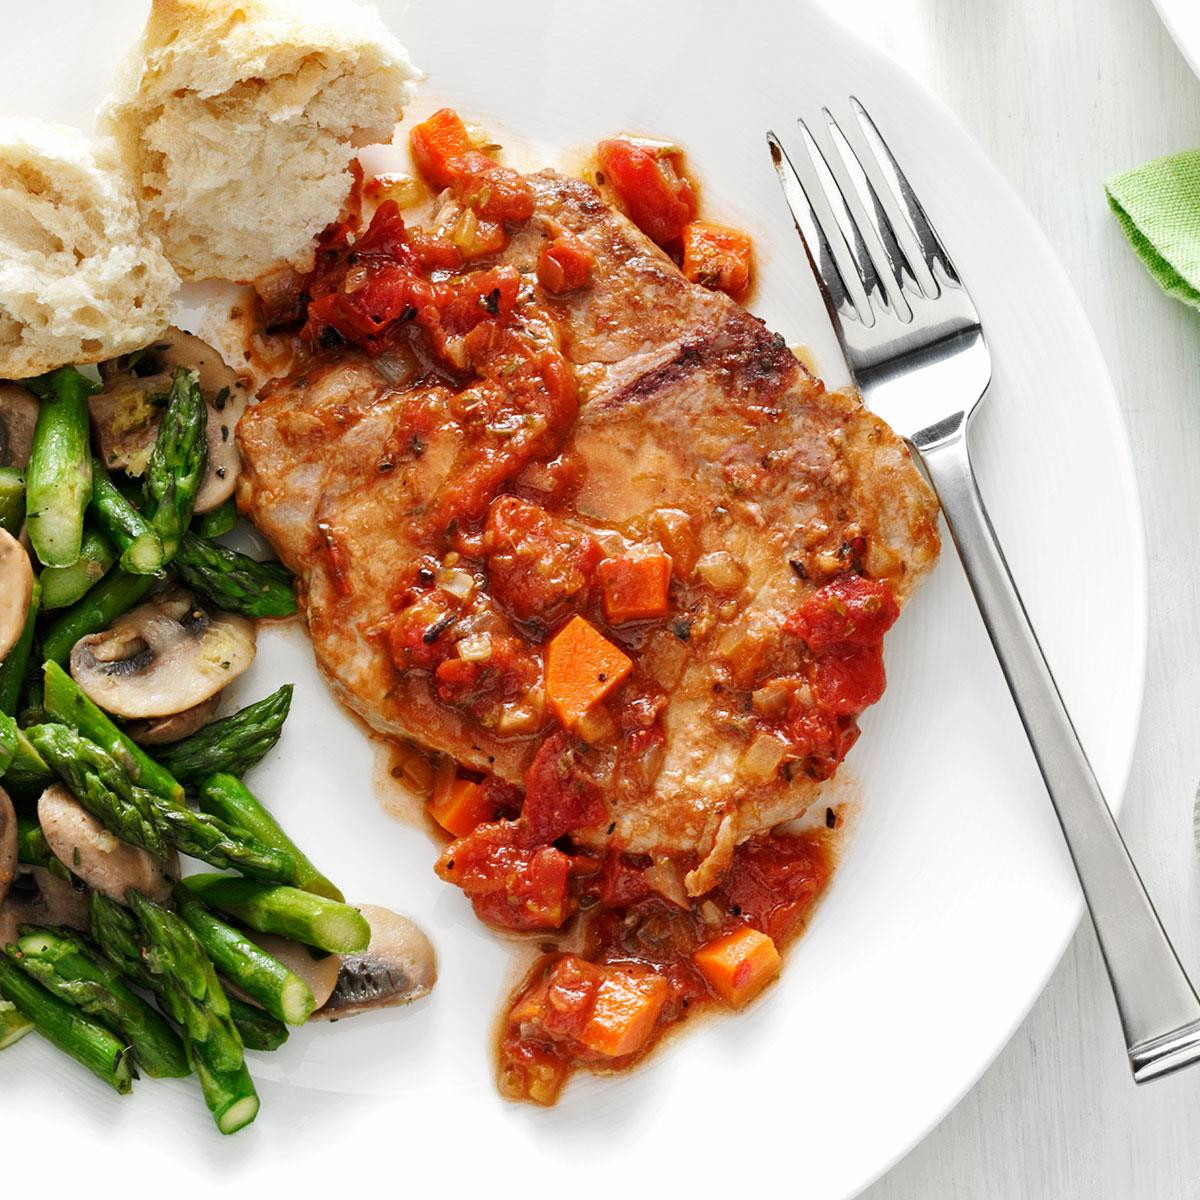 Heart Healthy Pork Chops  Tomato Topped Italian Pork Chops